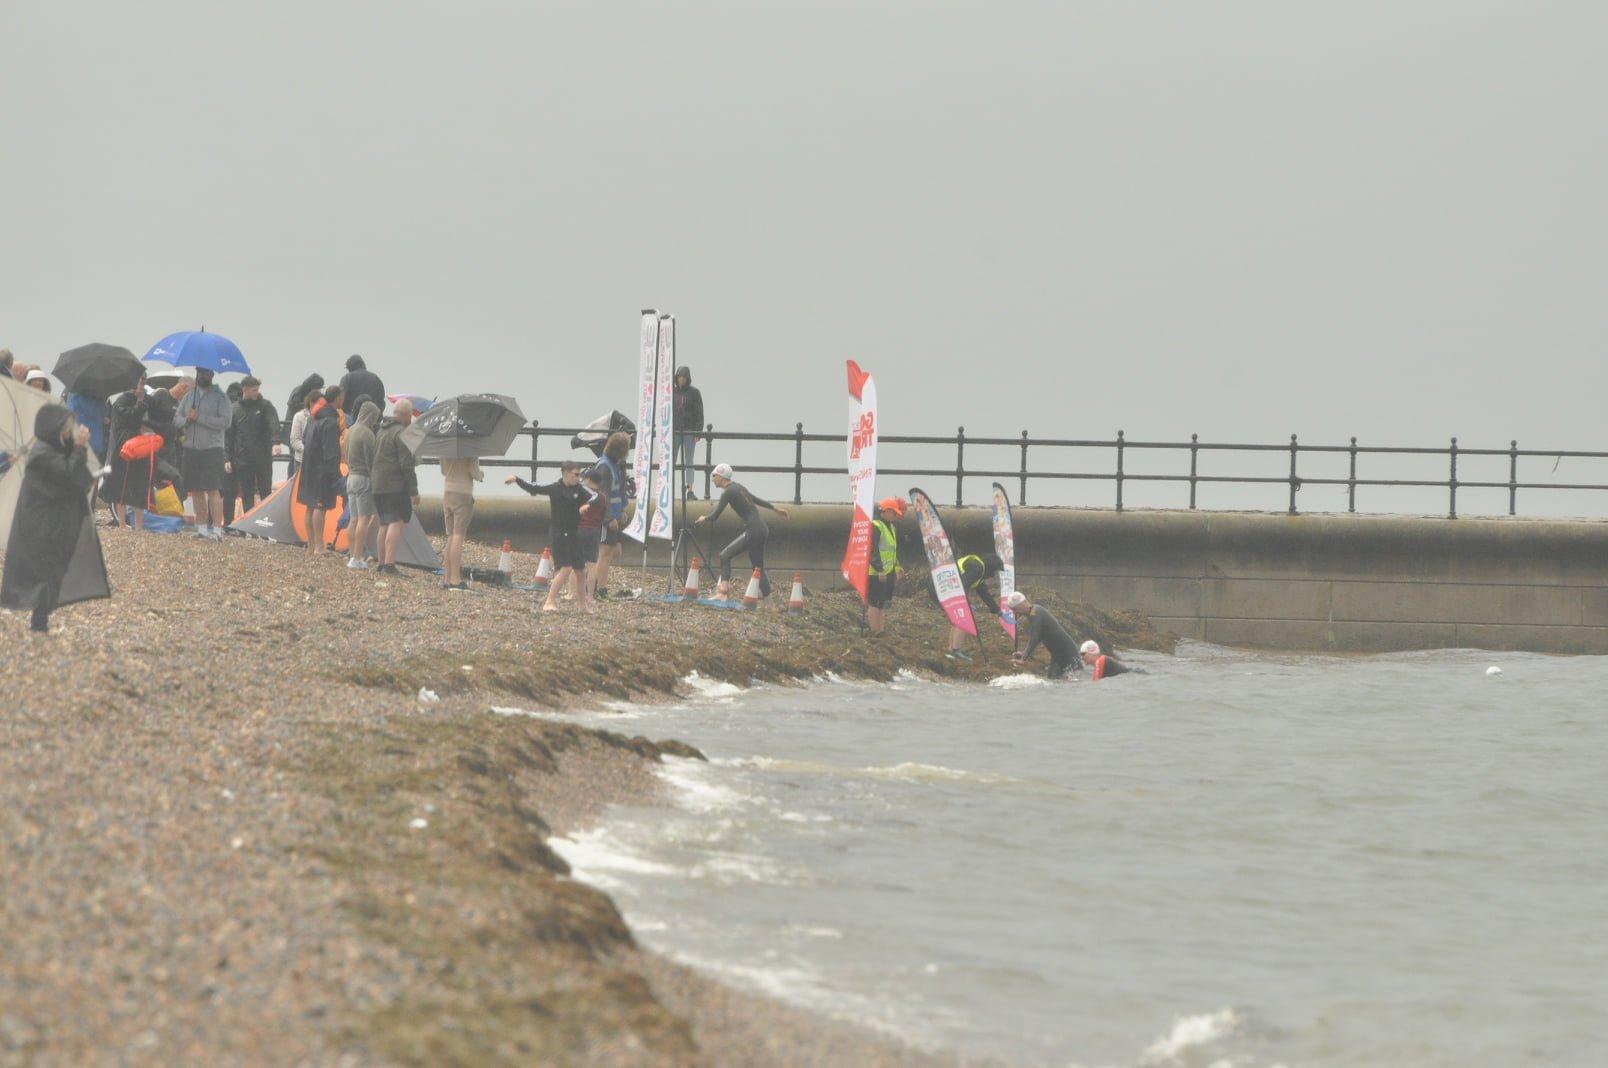 view of the beach towards the swim start line